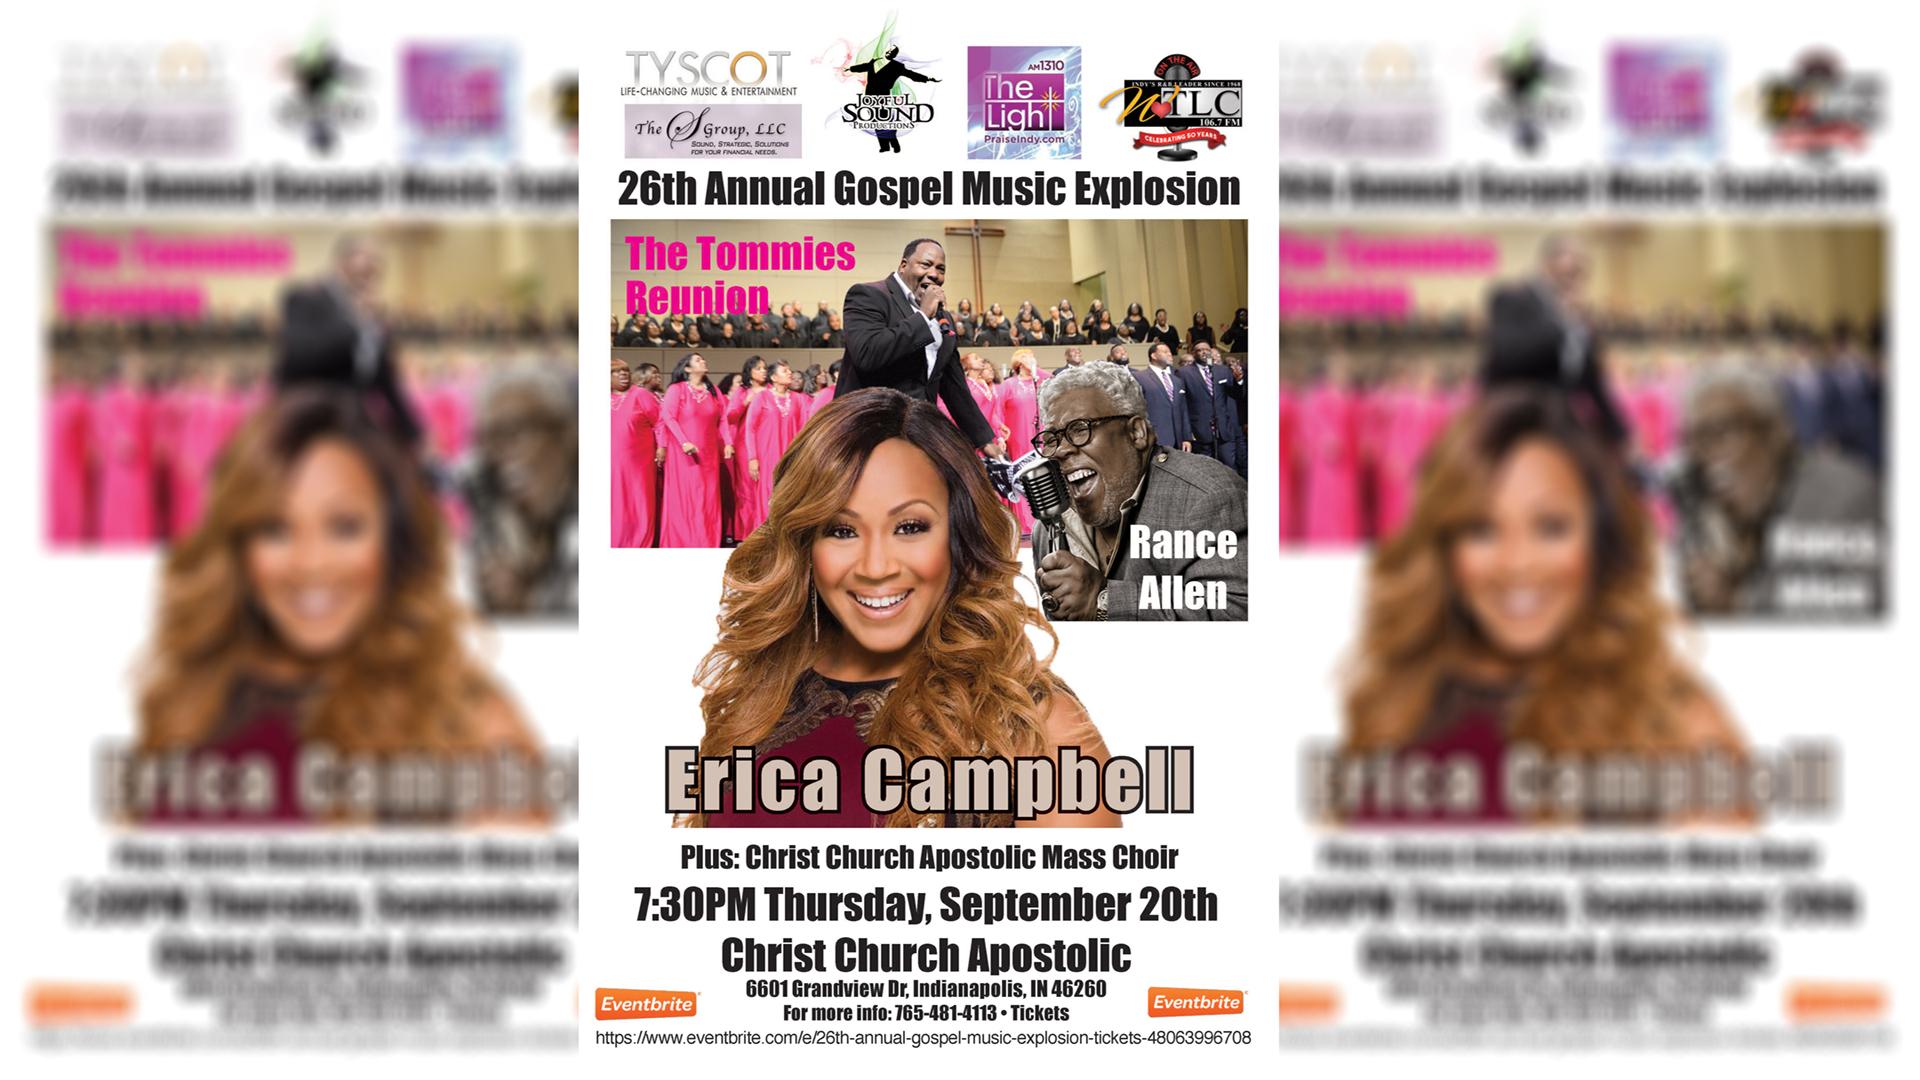 26th Annual Gospel Music Explosion Flyer